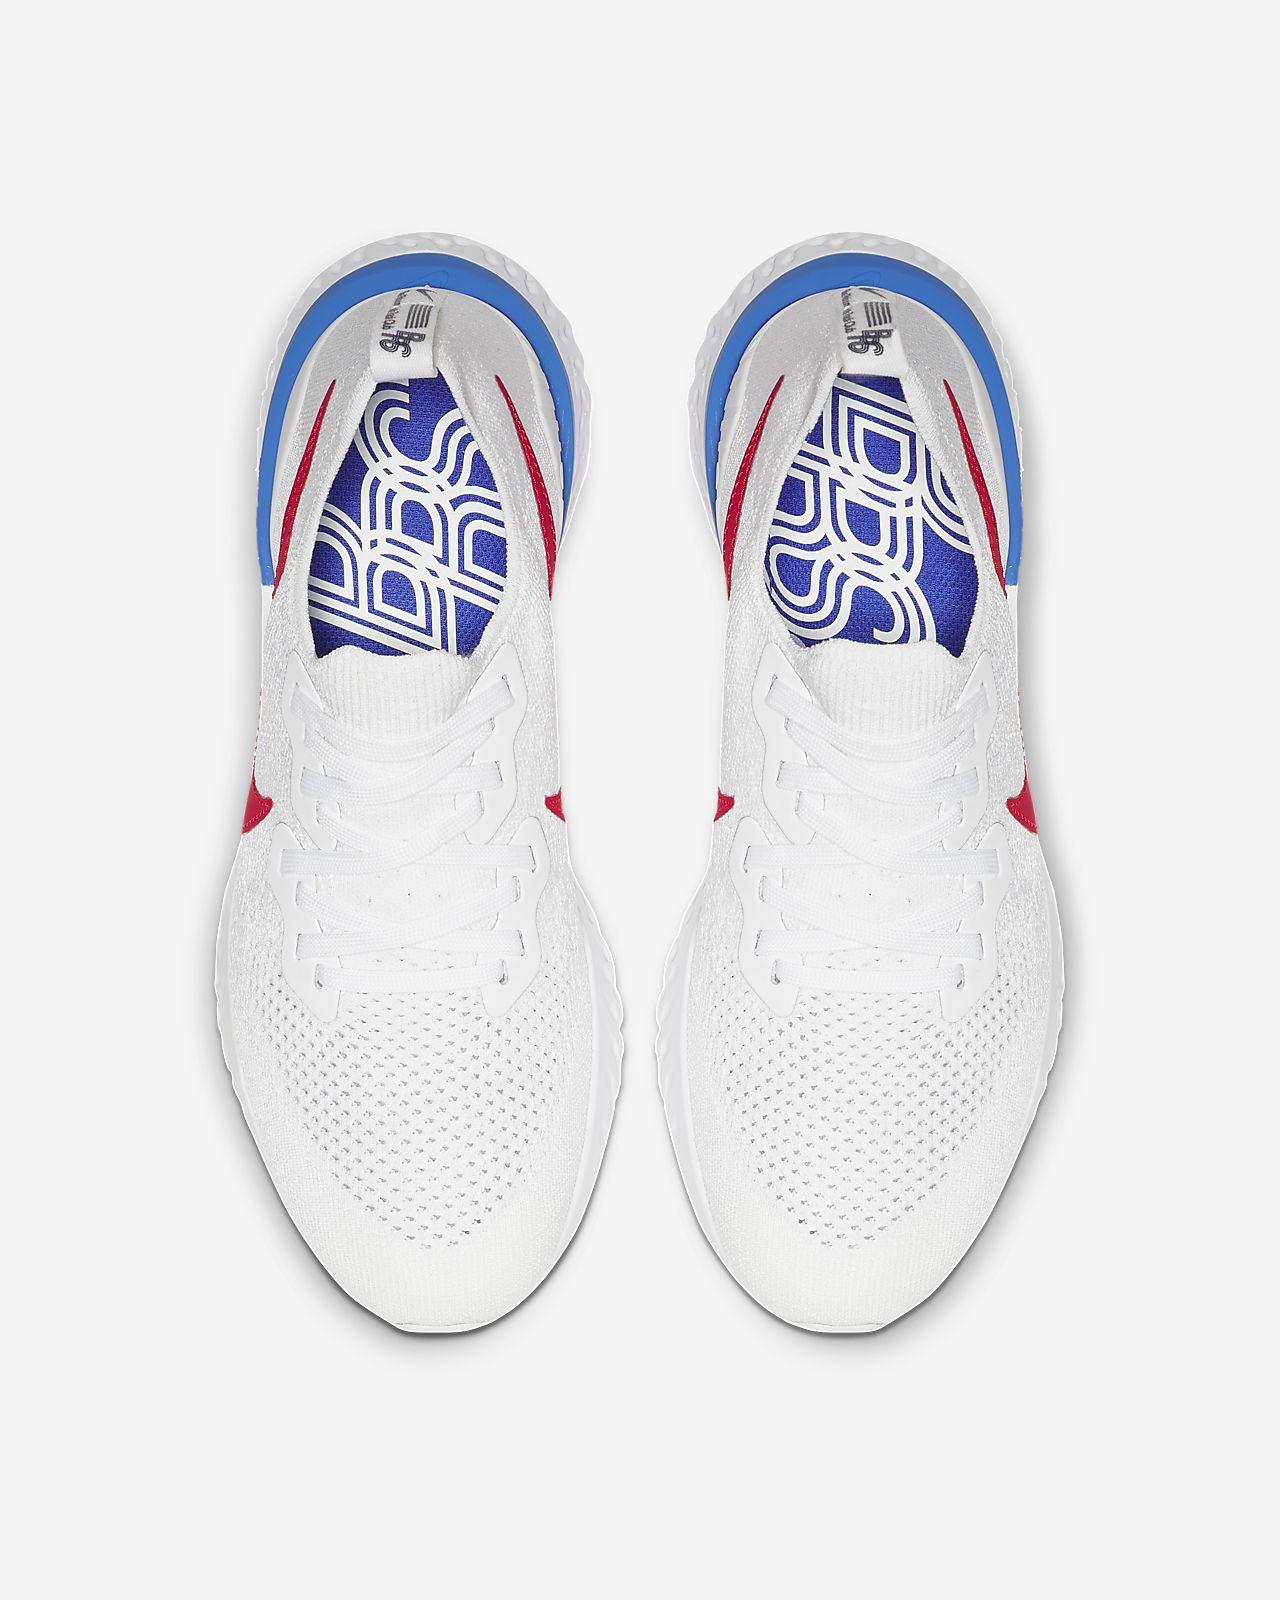 52f6993c997 Nike Epic React Flyknit 2 BRS Men's Running Shoe